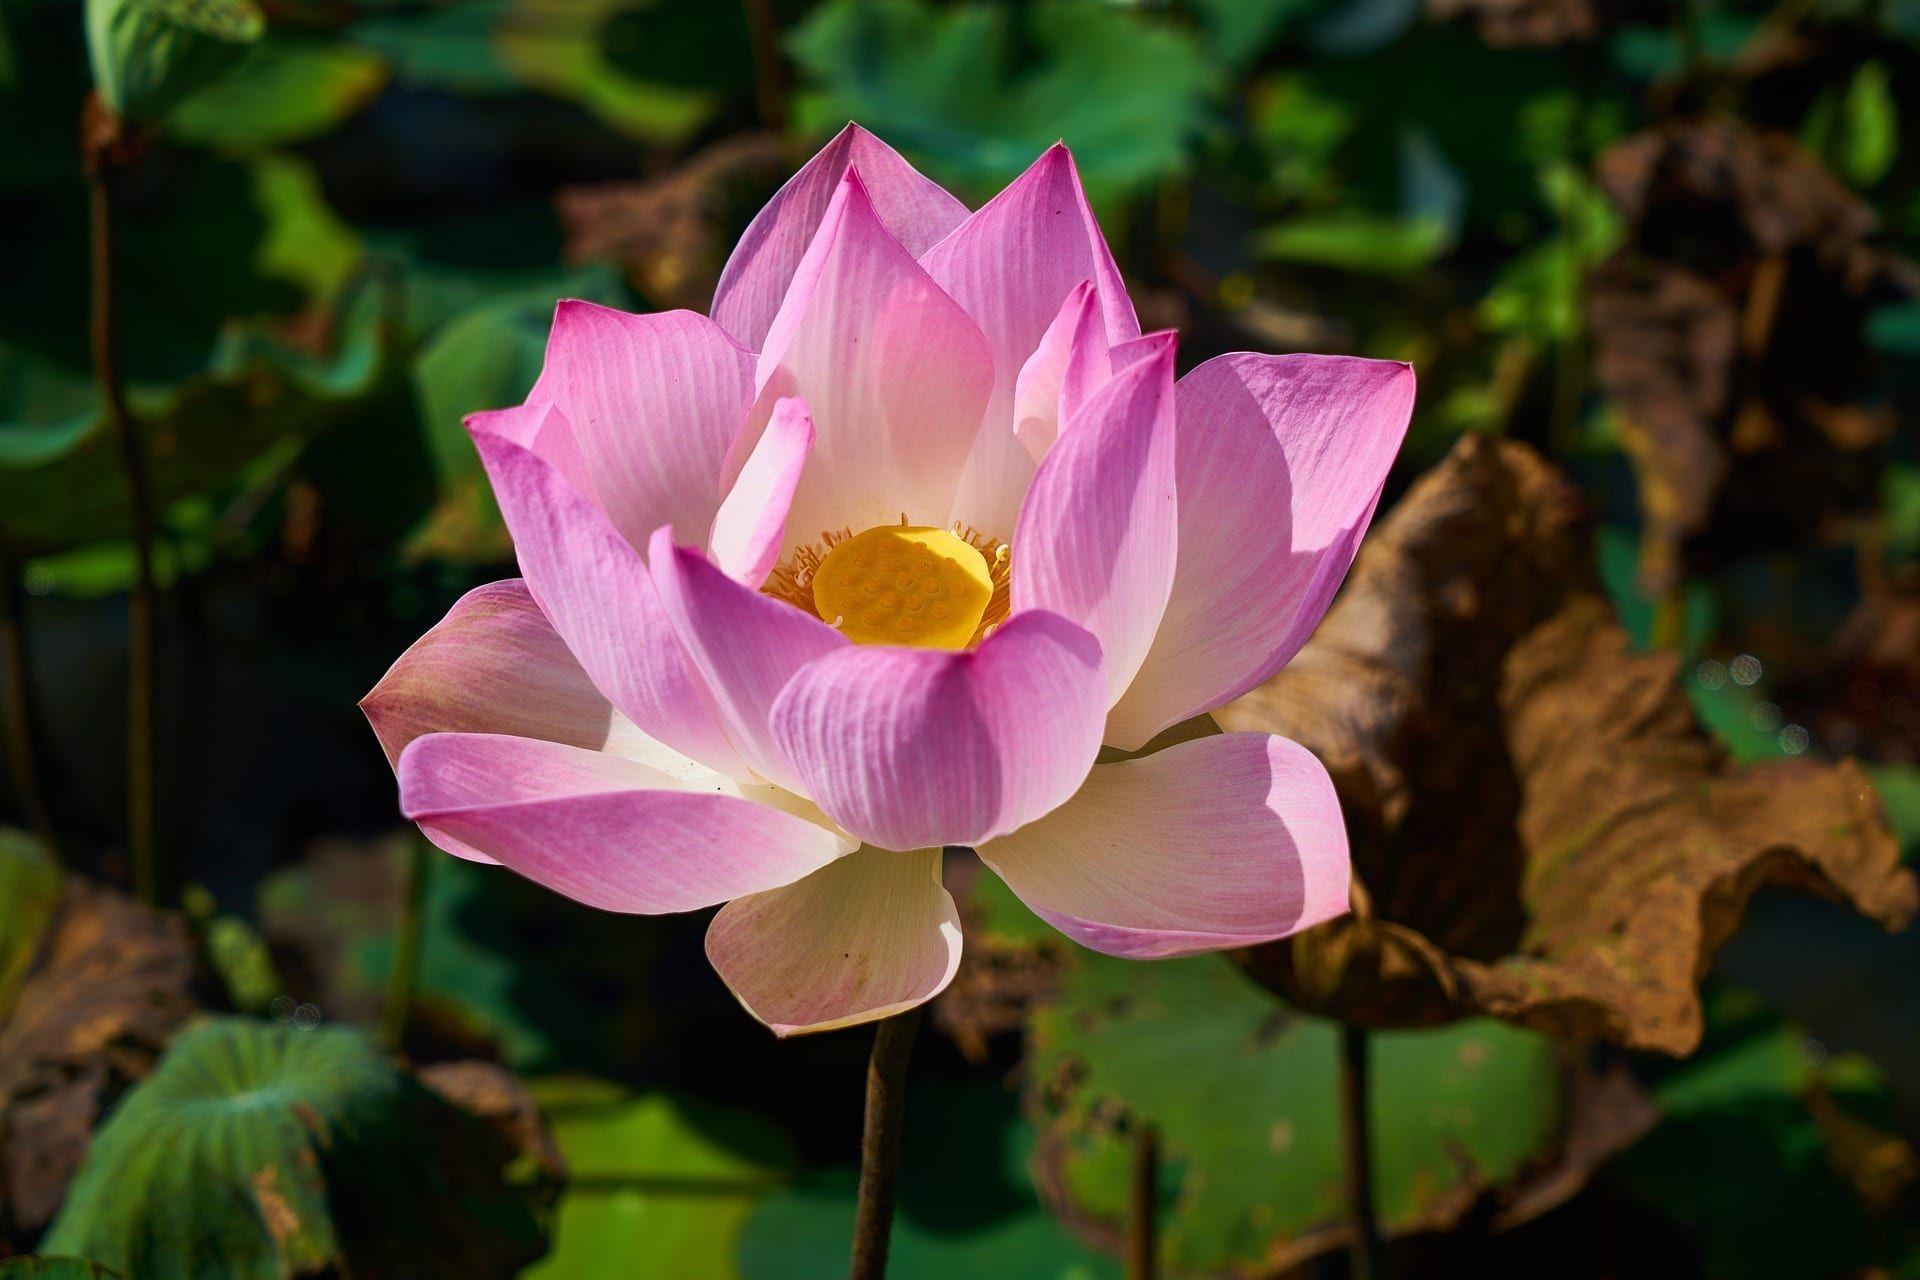 Tropical Gardening Gardening In The Tropics Flower